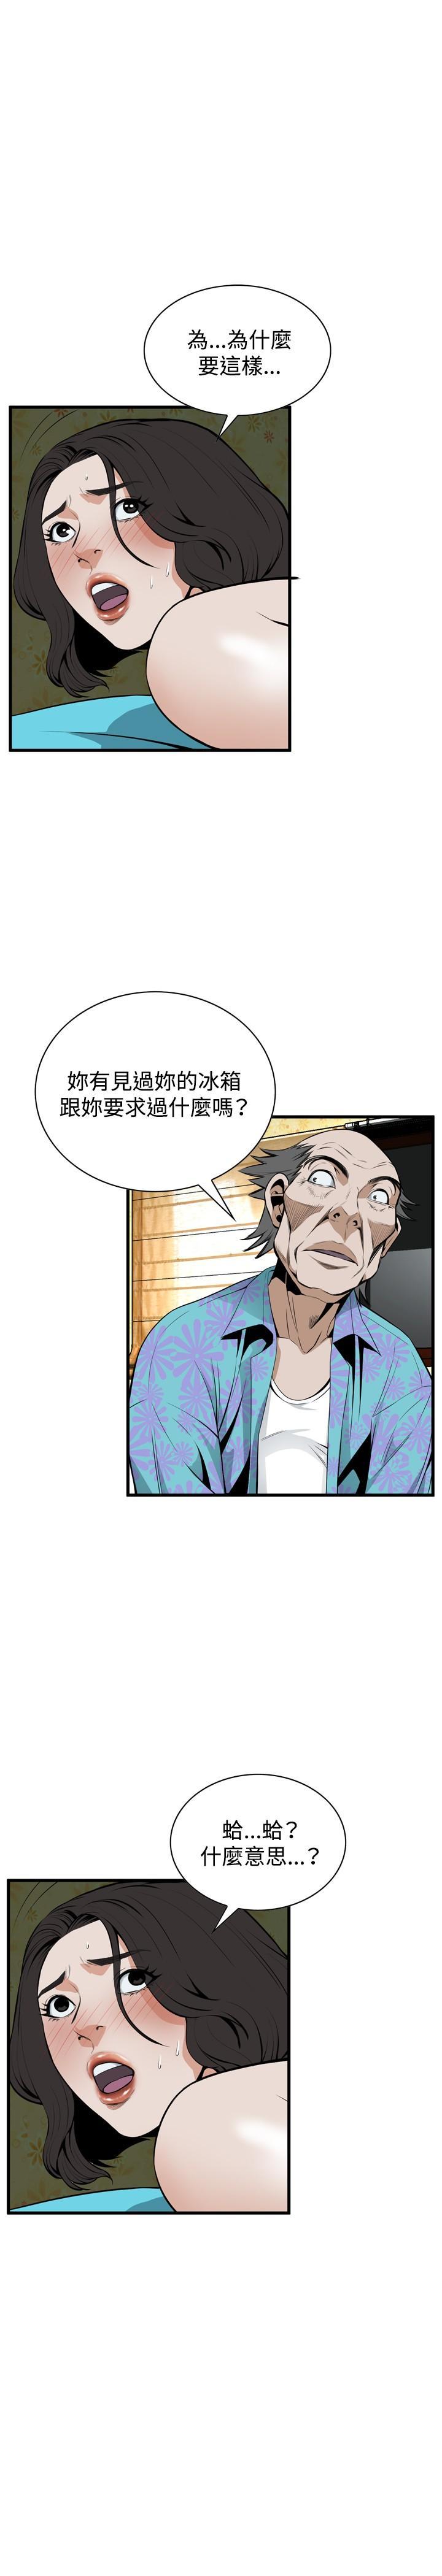 Take a Peek 偷窥 Ch.39~55 [Chinese]中文 131